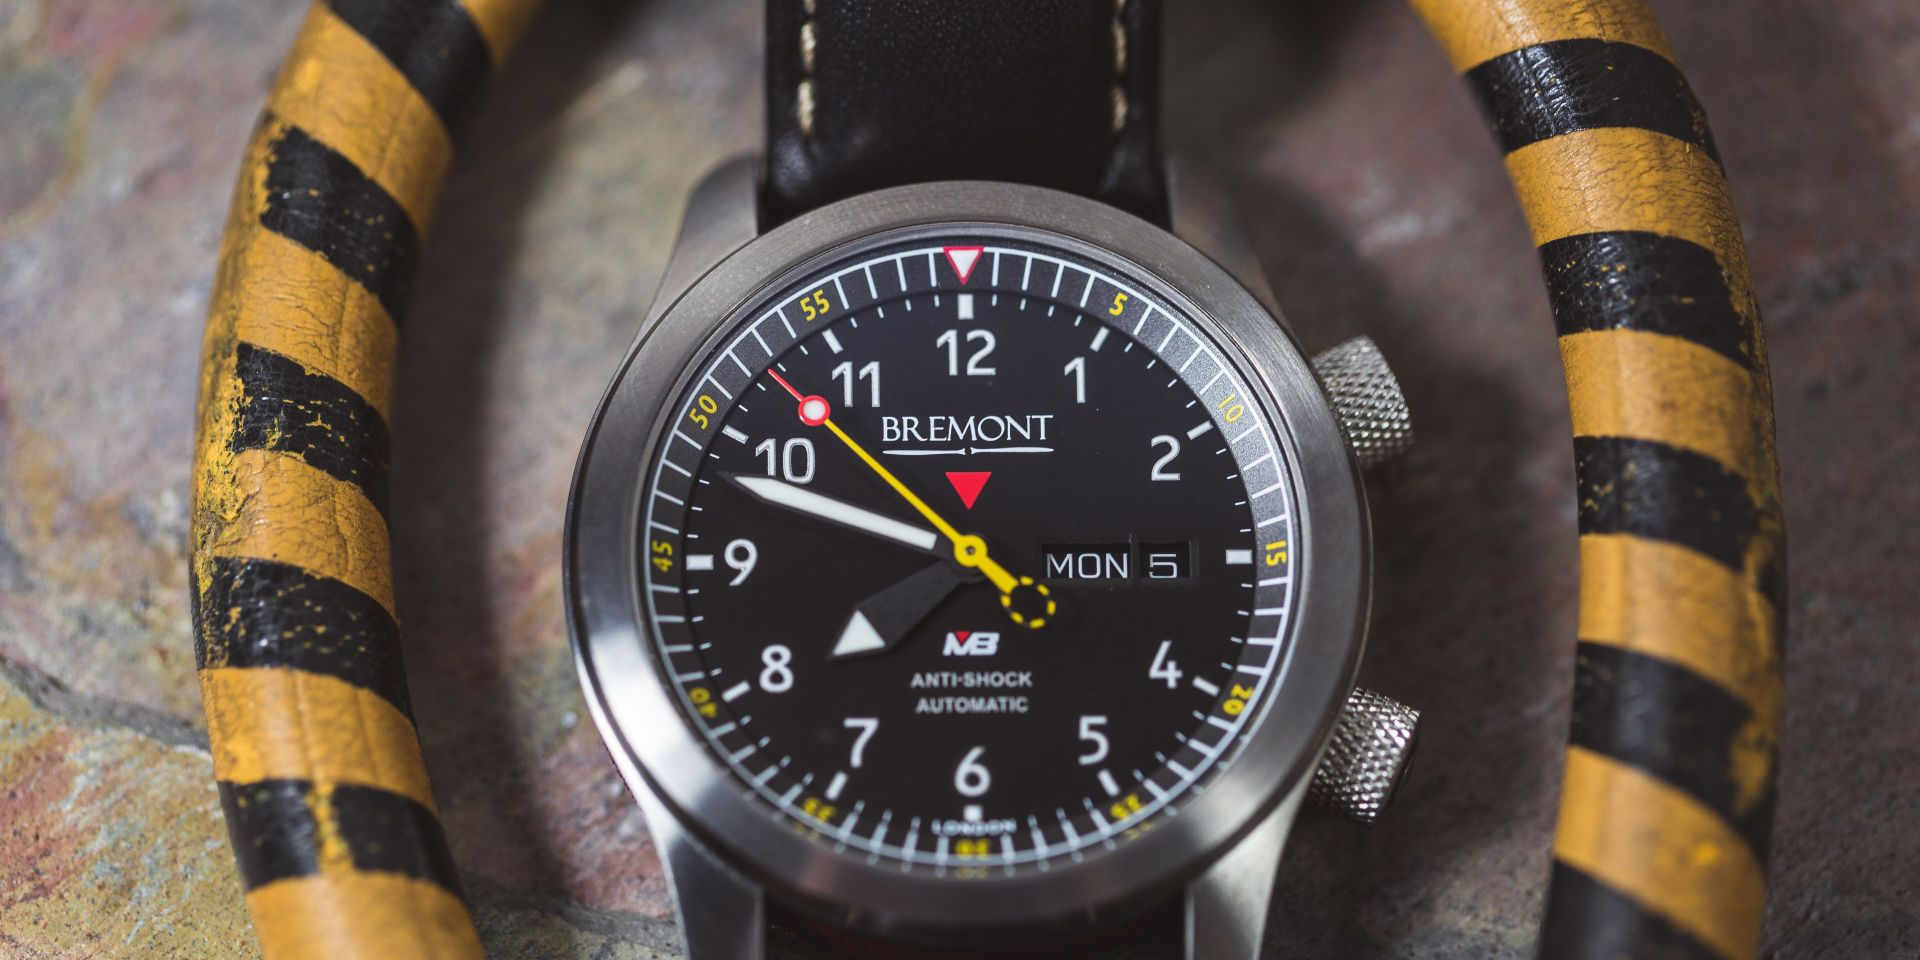 Bremont horloge